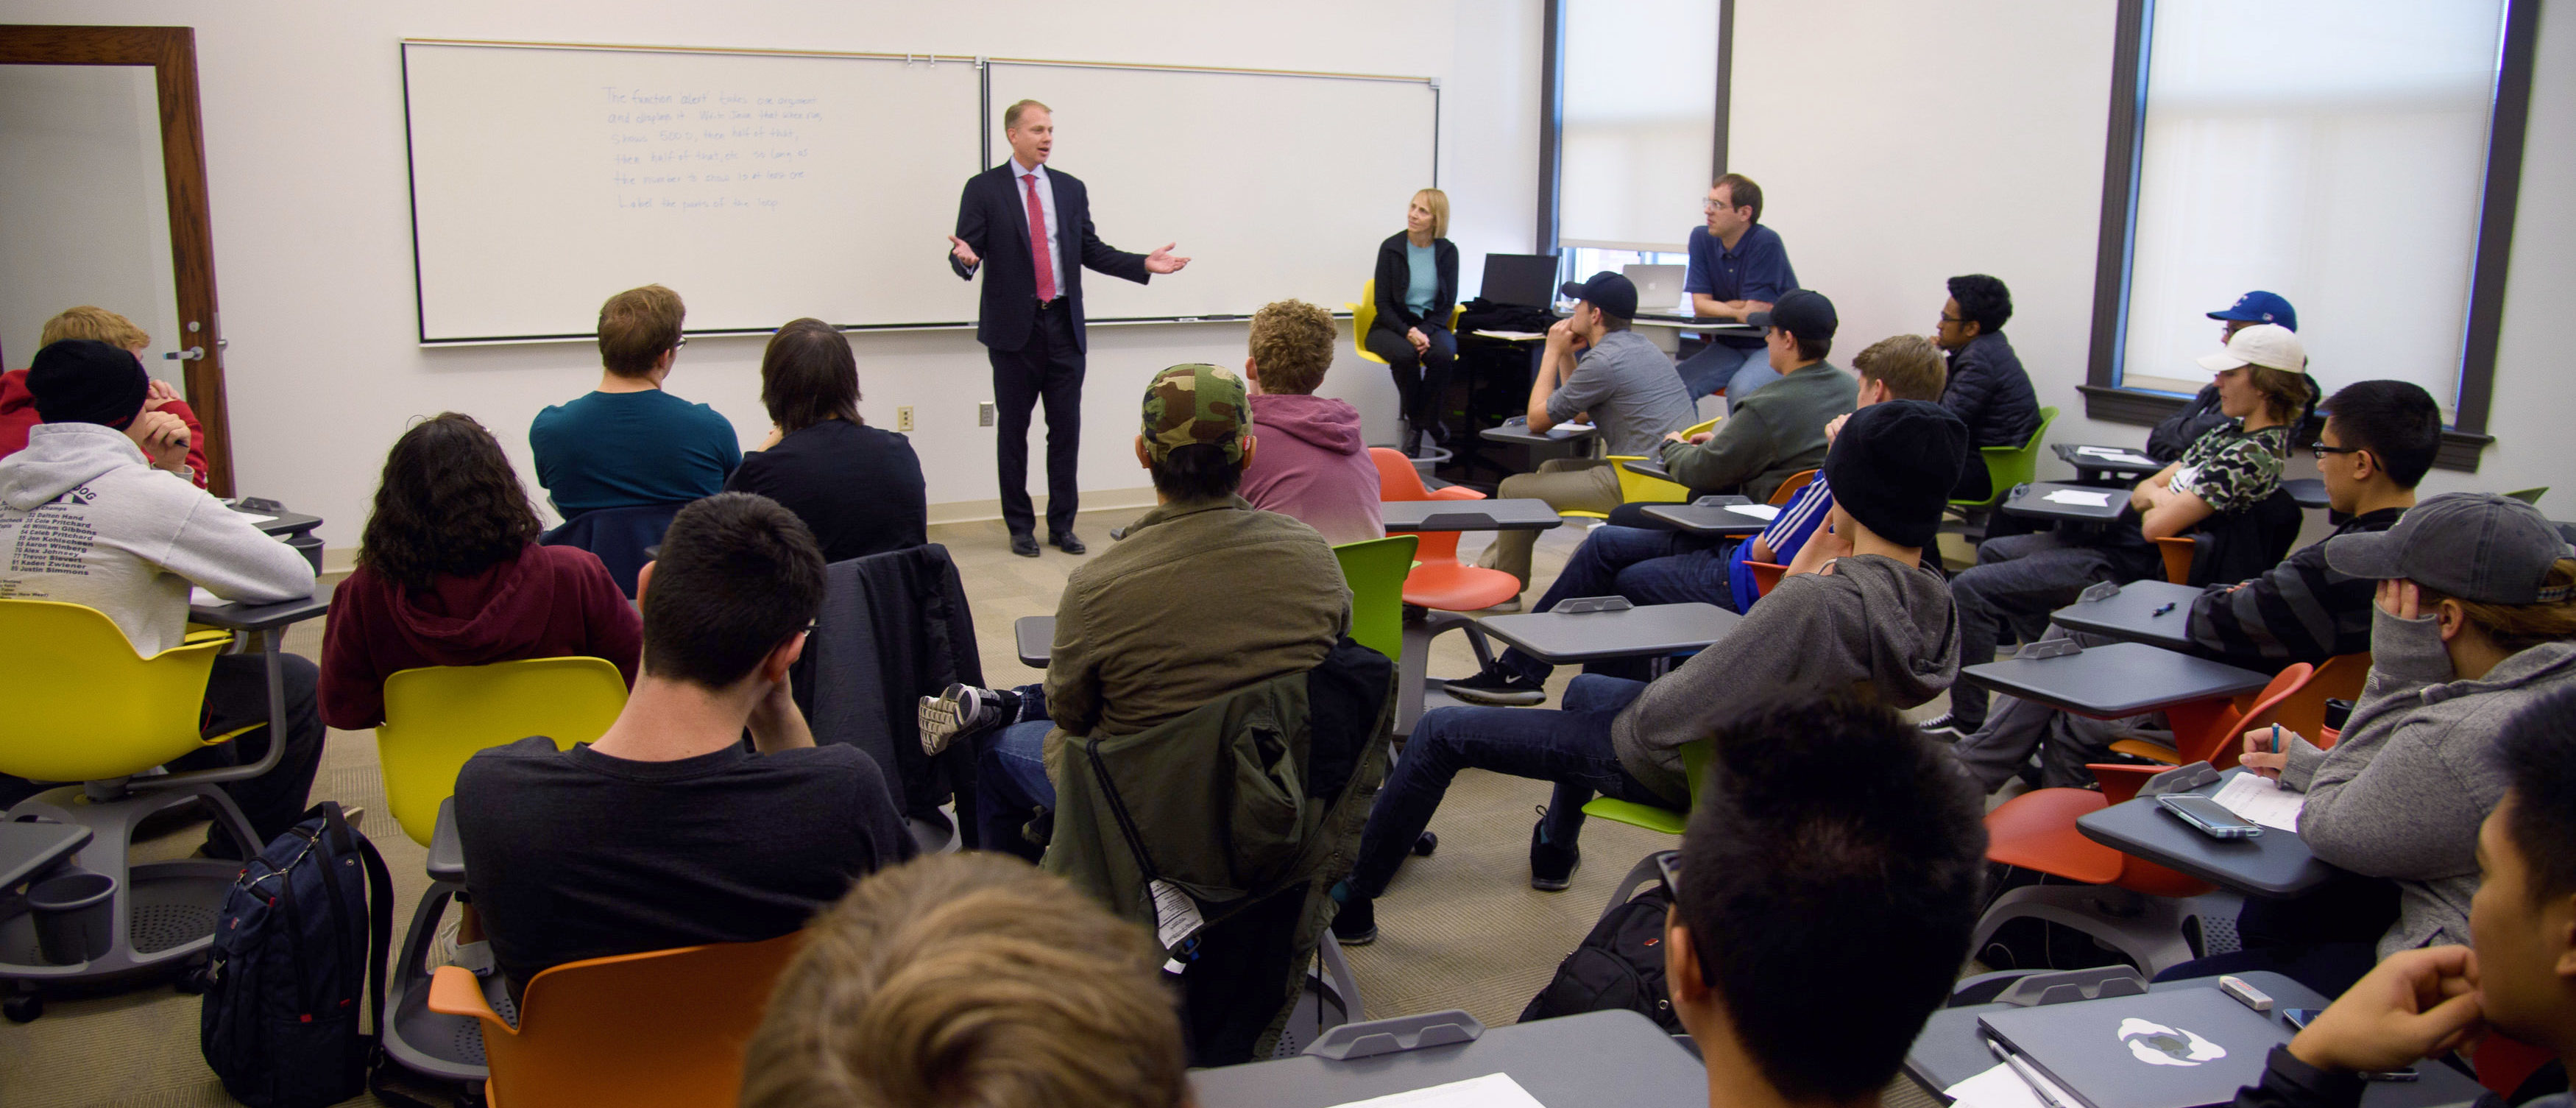 University of Nebraska-Lincoln and Nebraska Alumni Association acknowledges Brian Vaske, CEO of ITI Data, as a 2017 Alumni Master